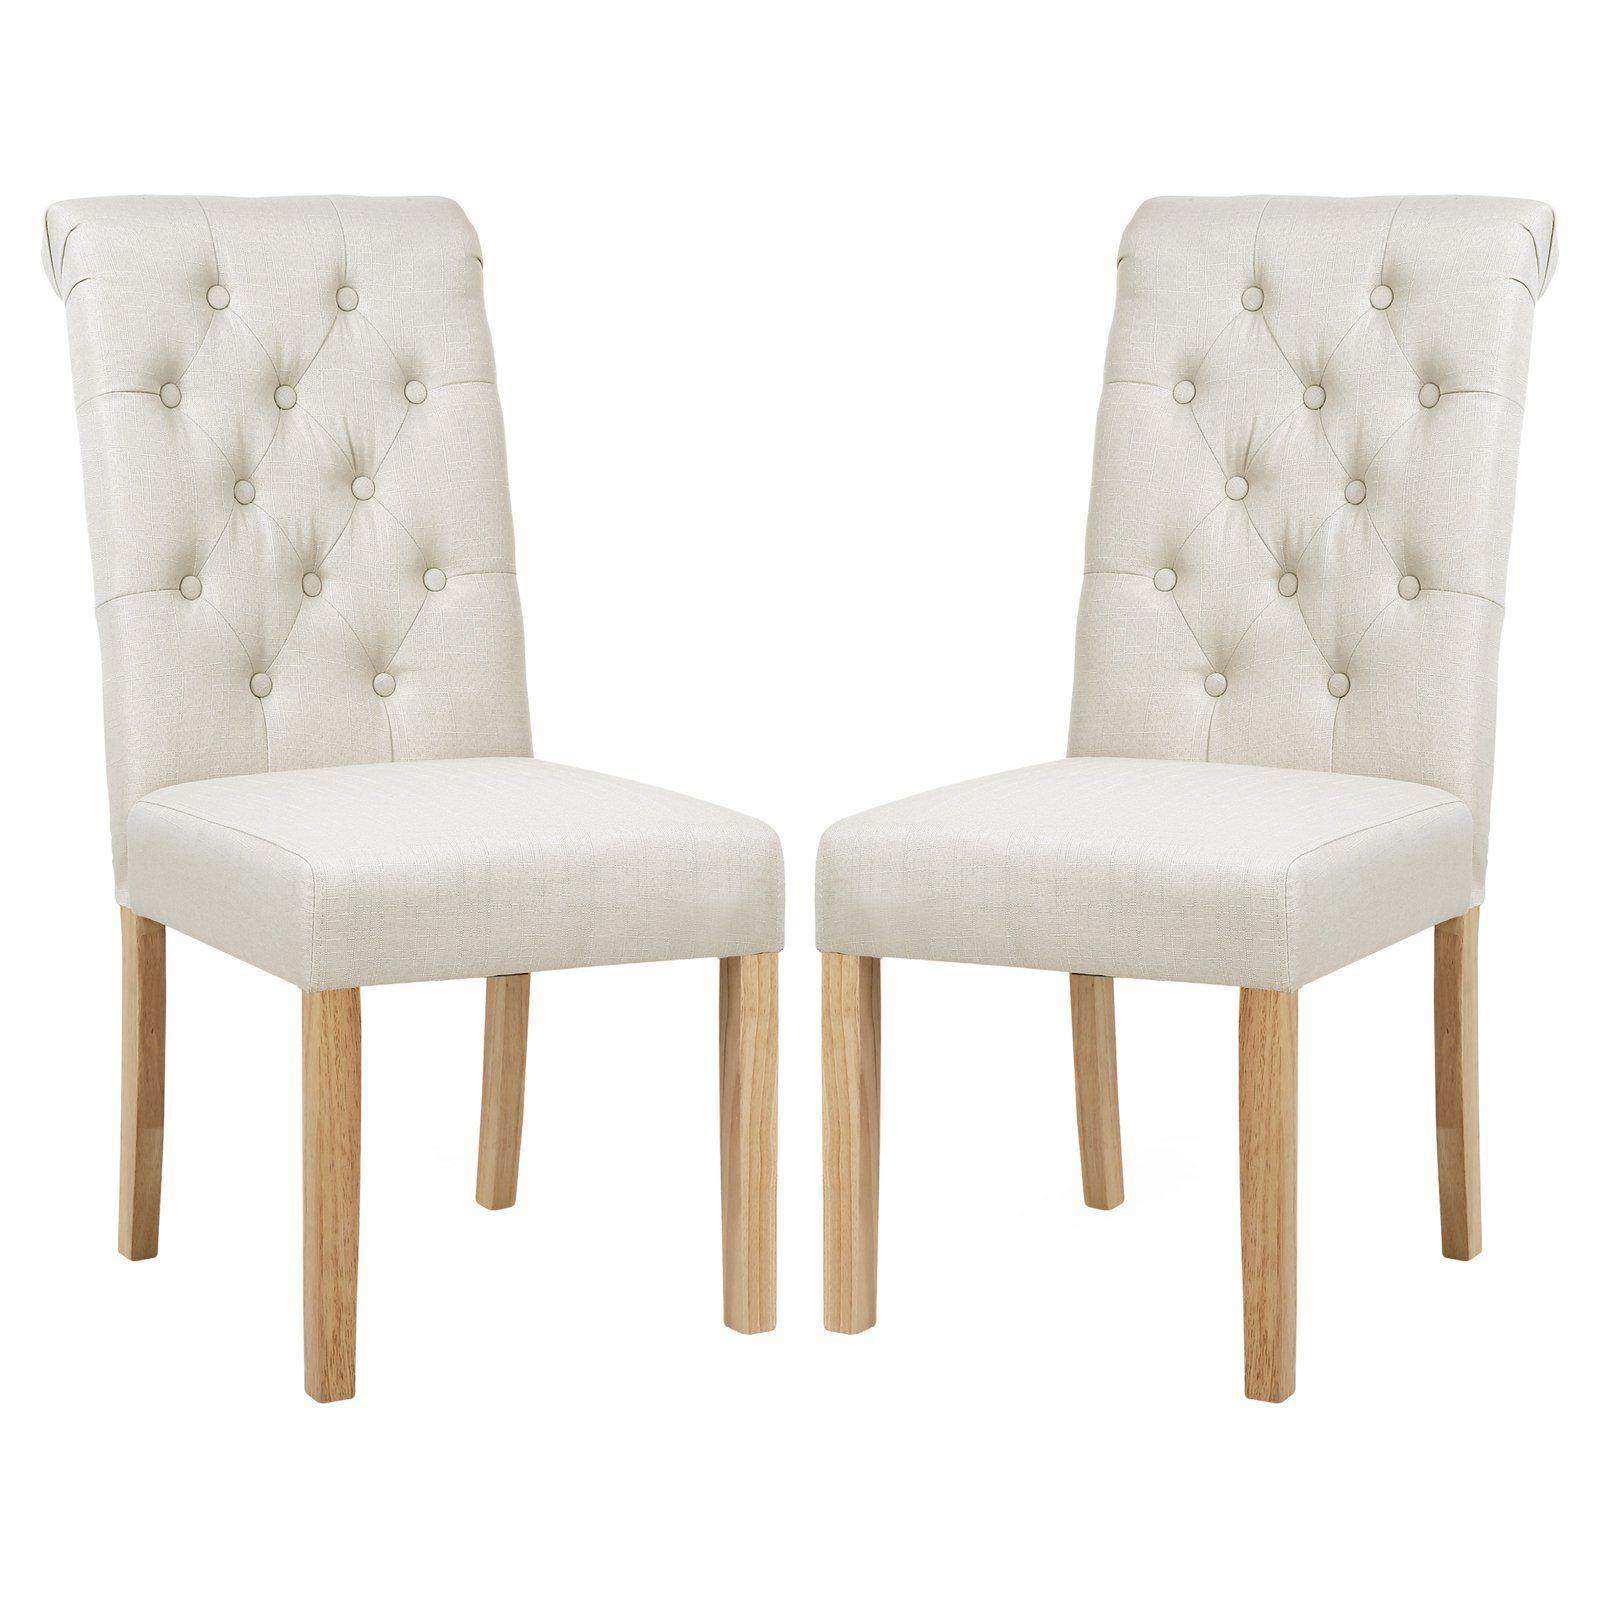 Edgemod Atlanta Tufted Parson Dining Chair Set Of 2 Dining Chairs Ivory Dining Chairs High Back Dining Chairs